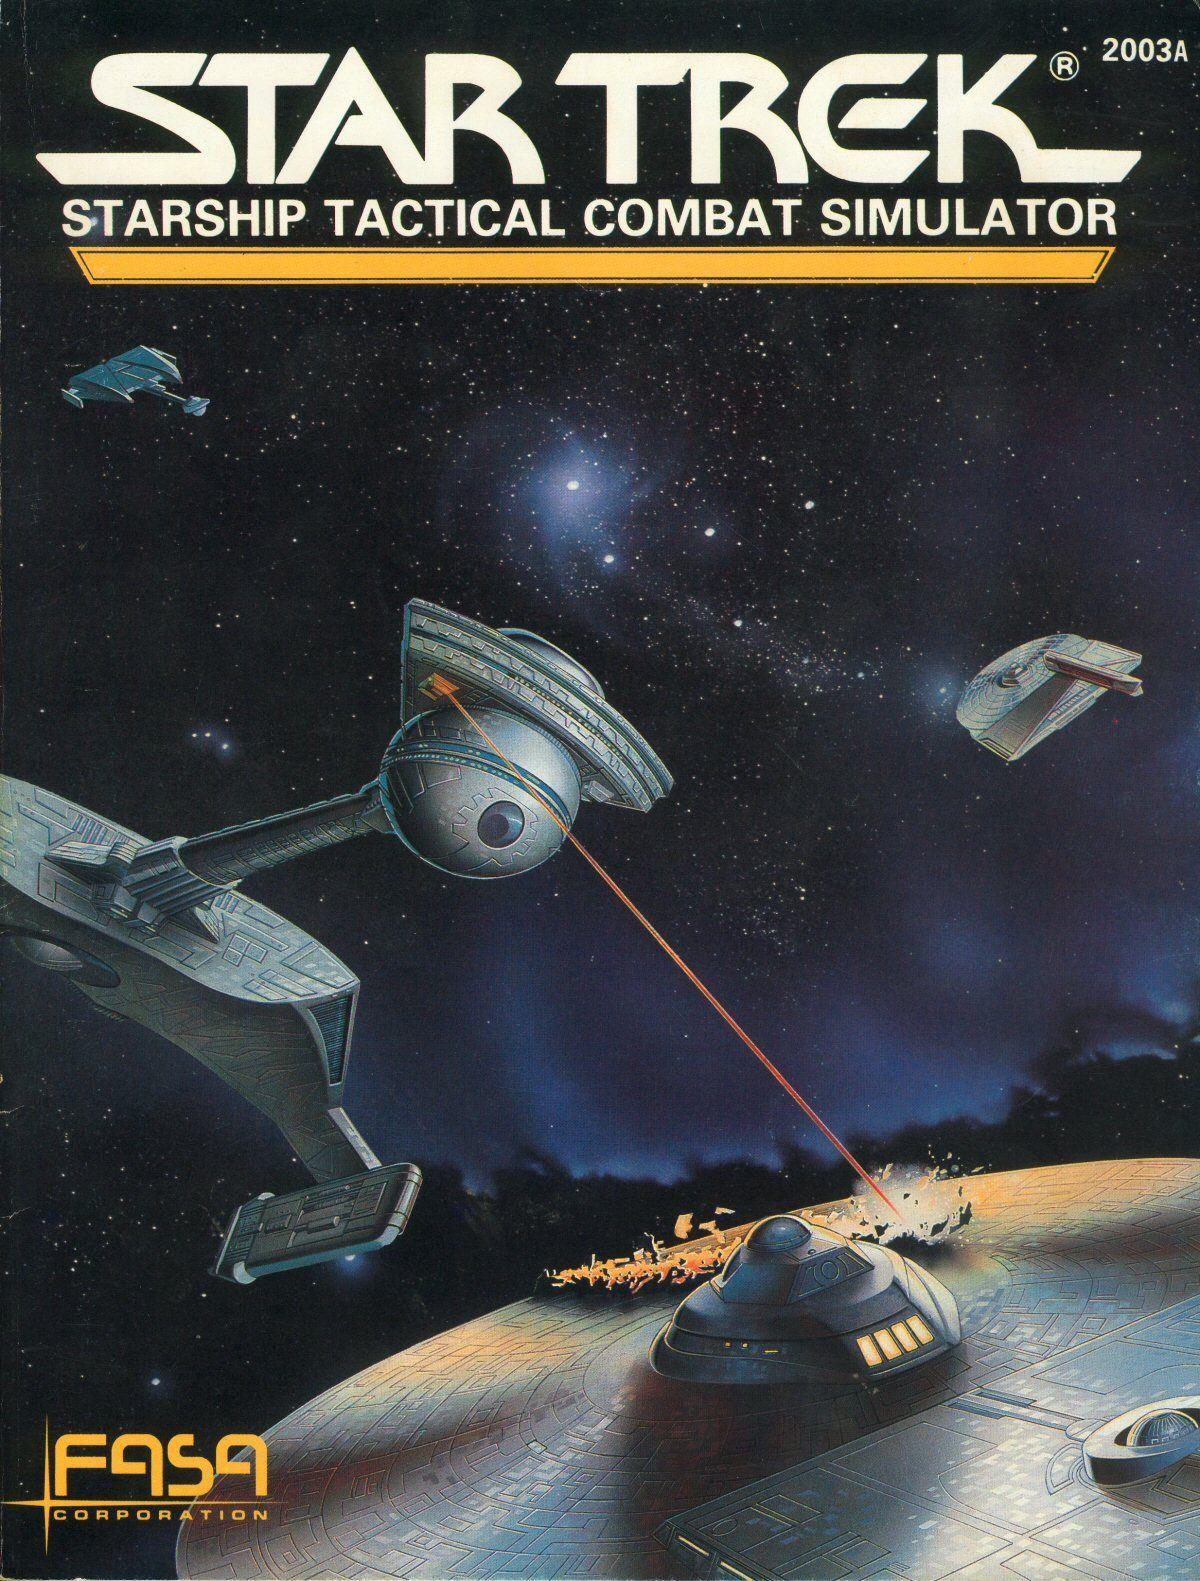 Star Trek: Starship Tactical Combat Simulator